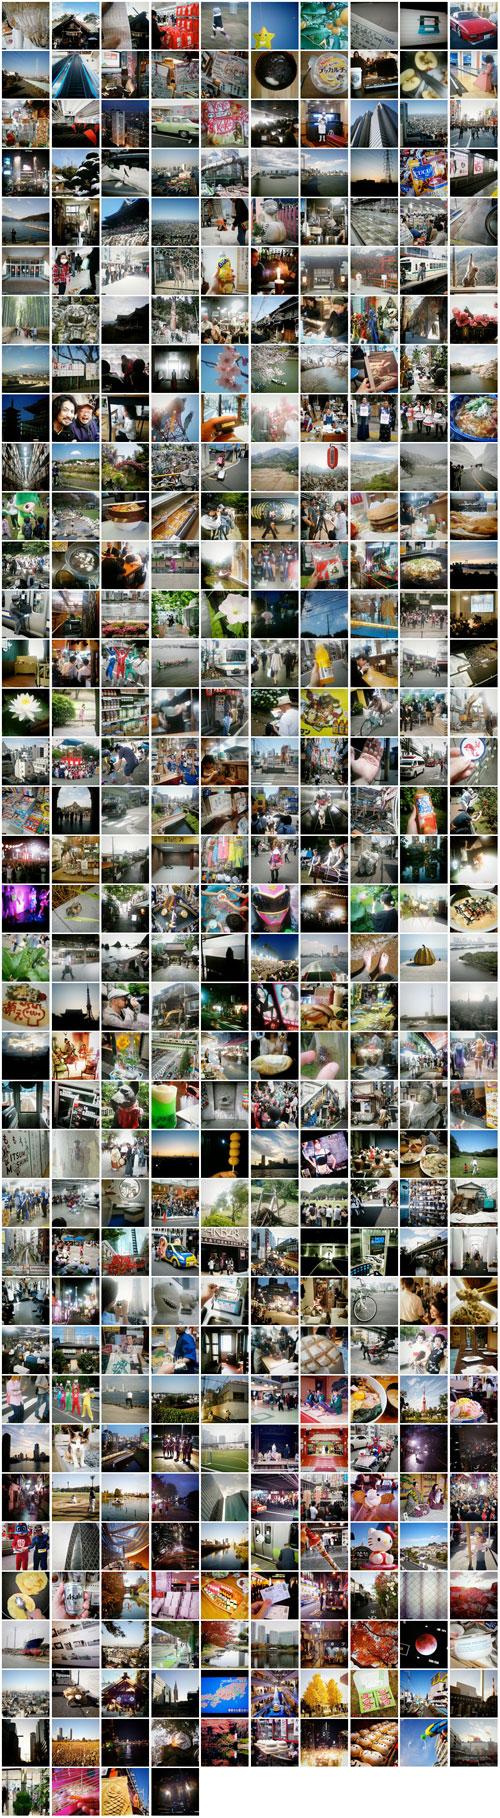 Japon 2011 en 365 photos